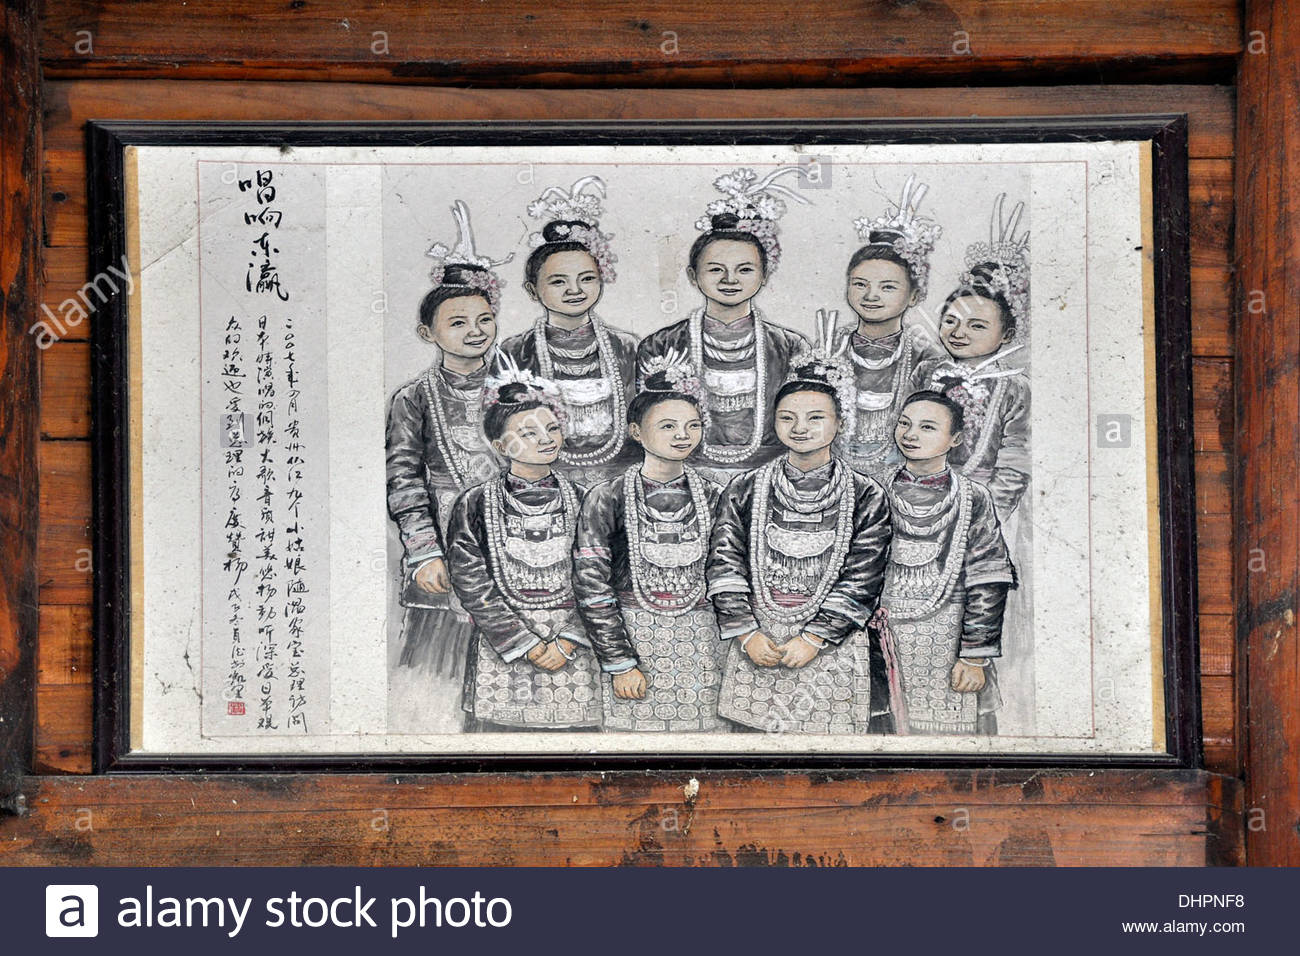 China,Guizhou province,Zhaoxing village,traditional print Stock Photo